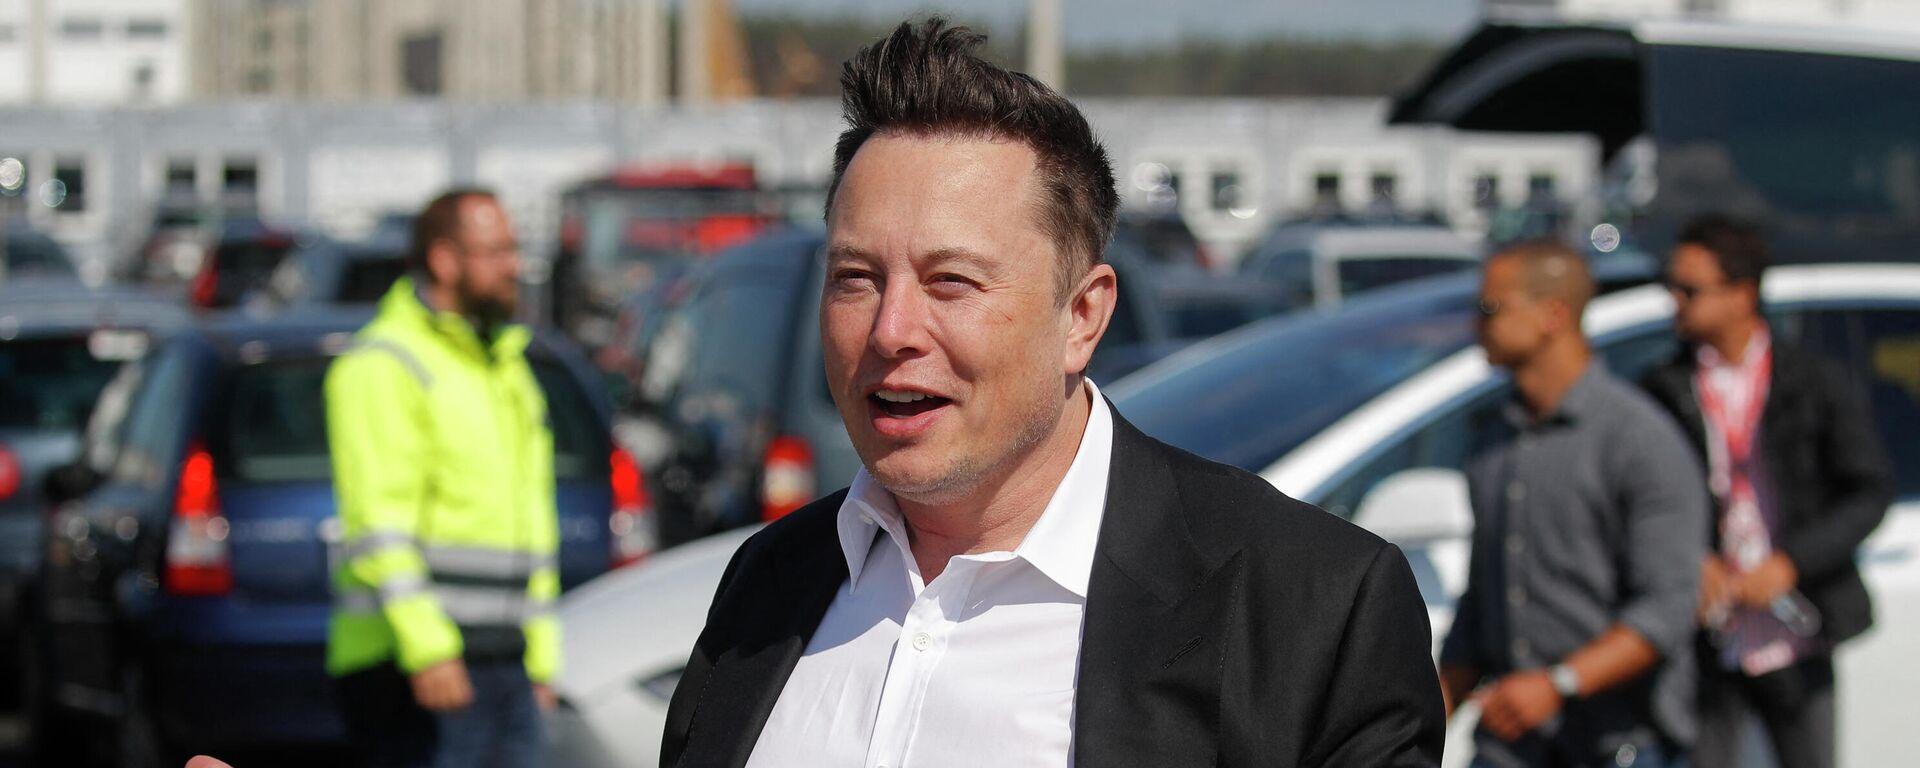 Elon Musk in Grünheide - SNA, 1920, 12.10.2021